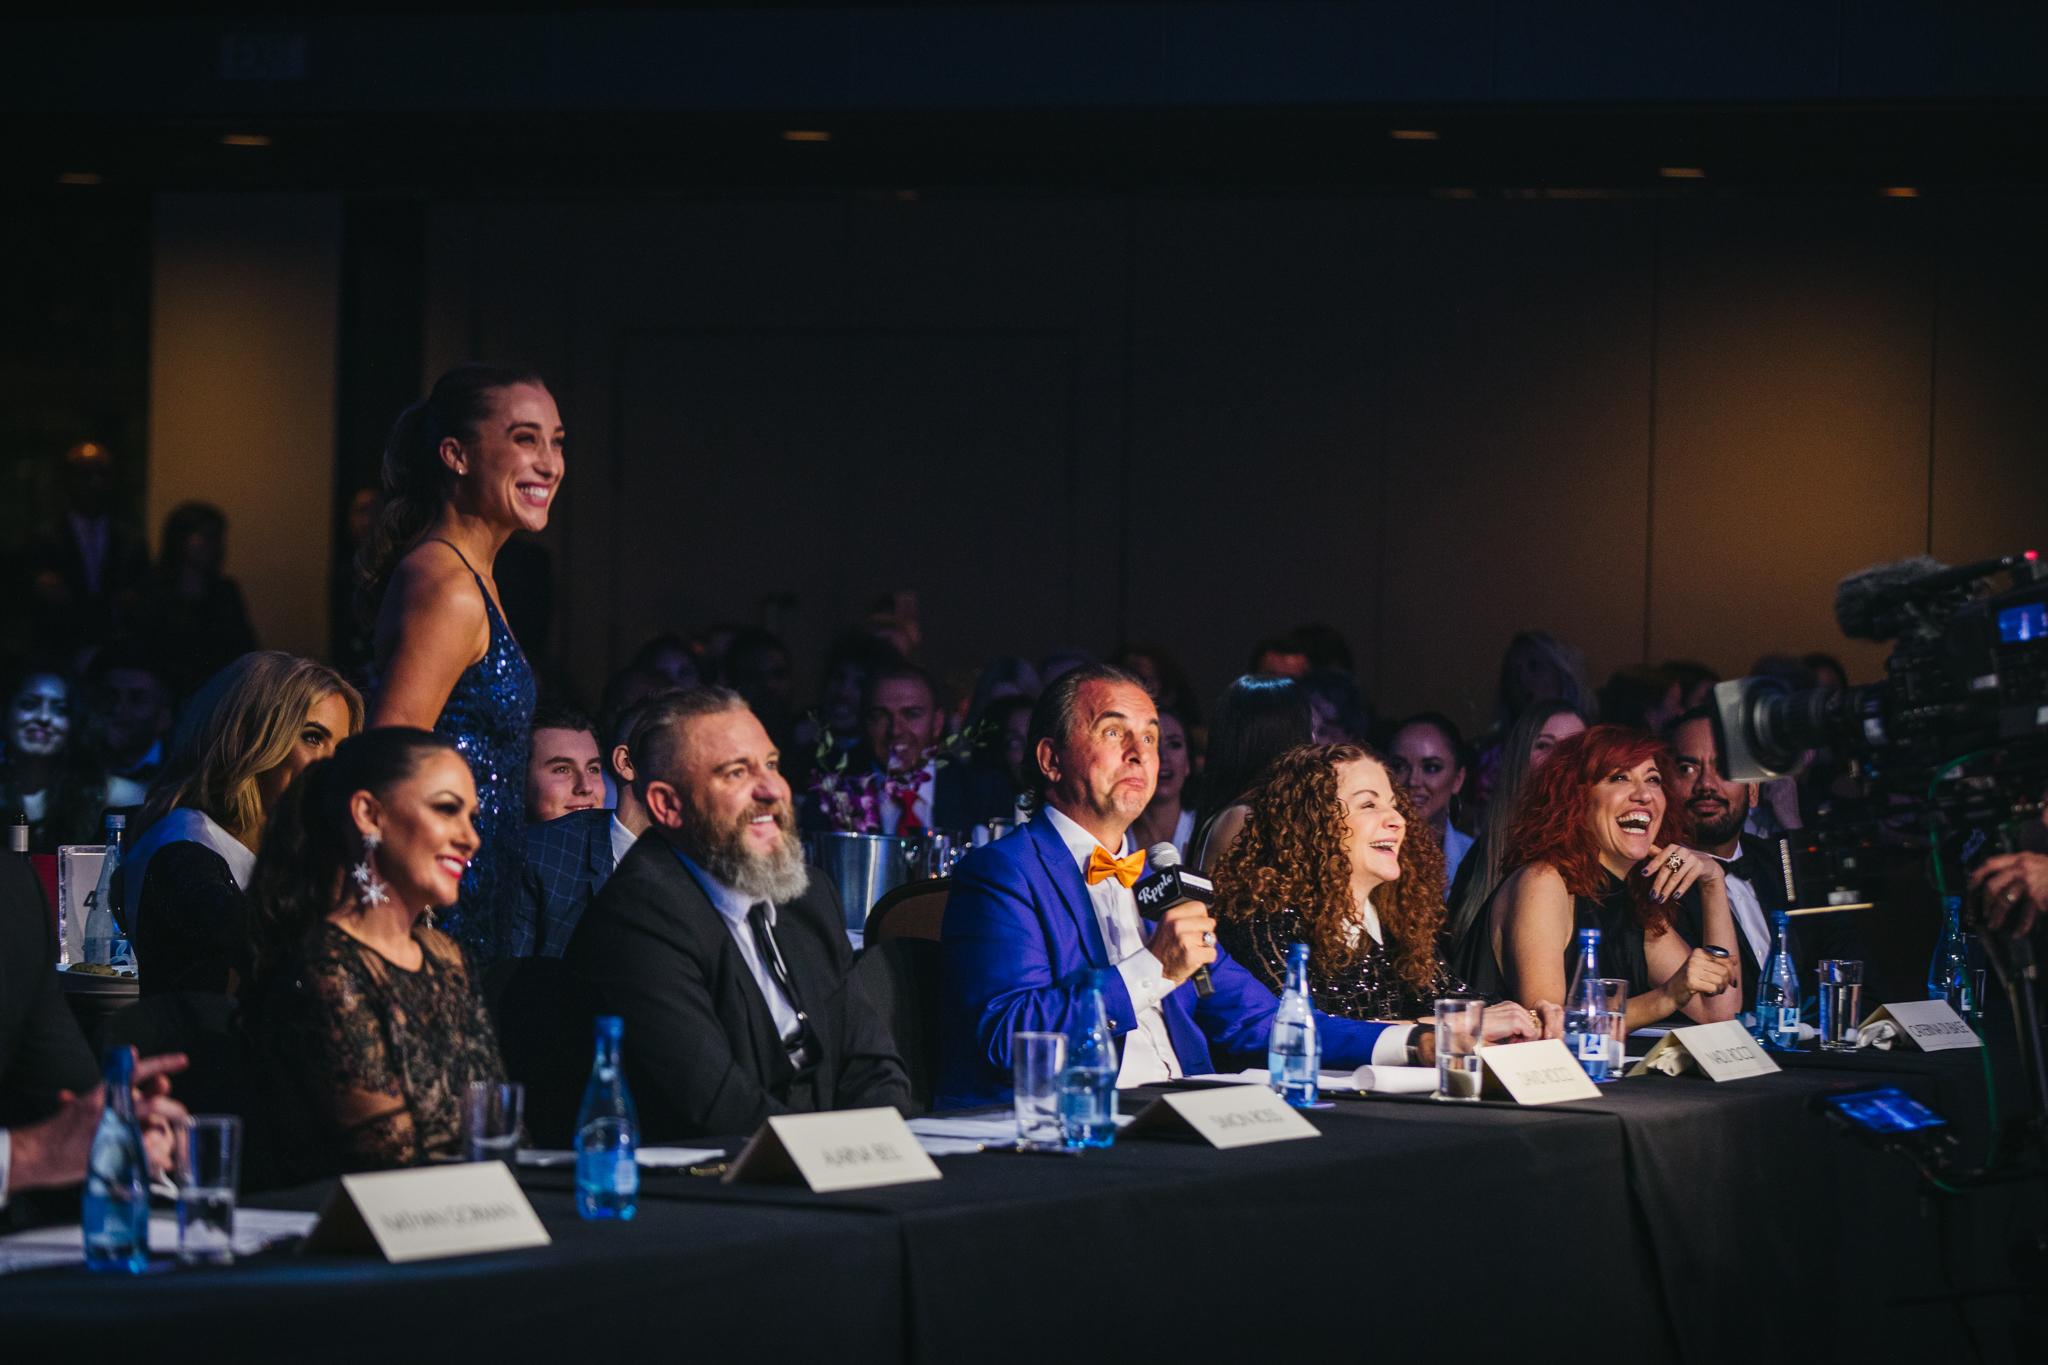 Judging Miss Universe Australia